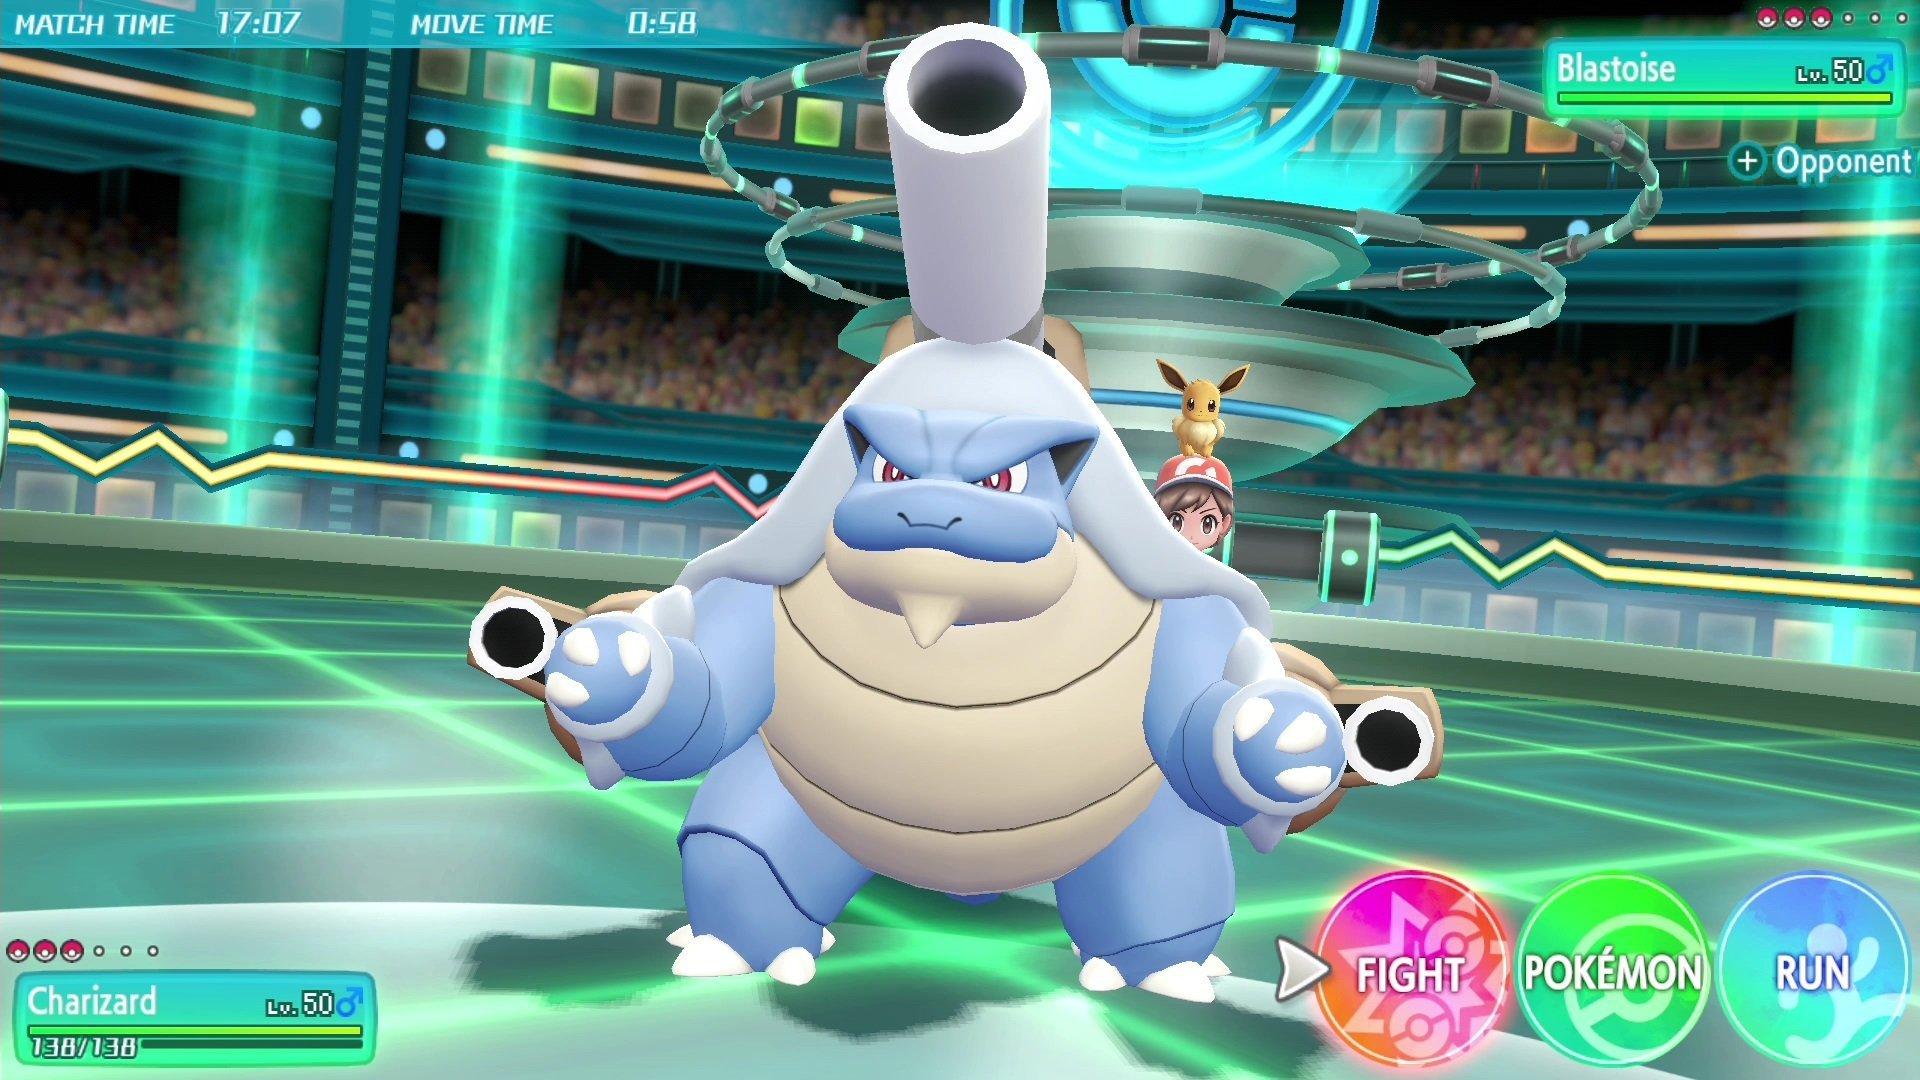 How to get more Master Balls in Pokemon: Let's Go | Shacknews